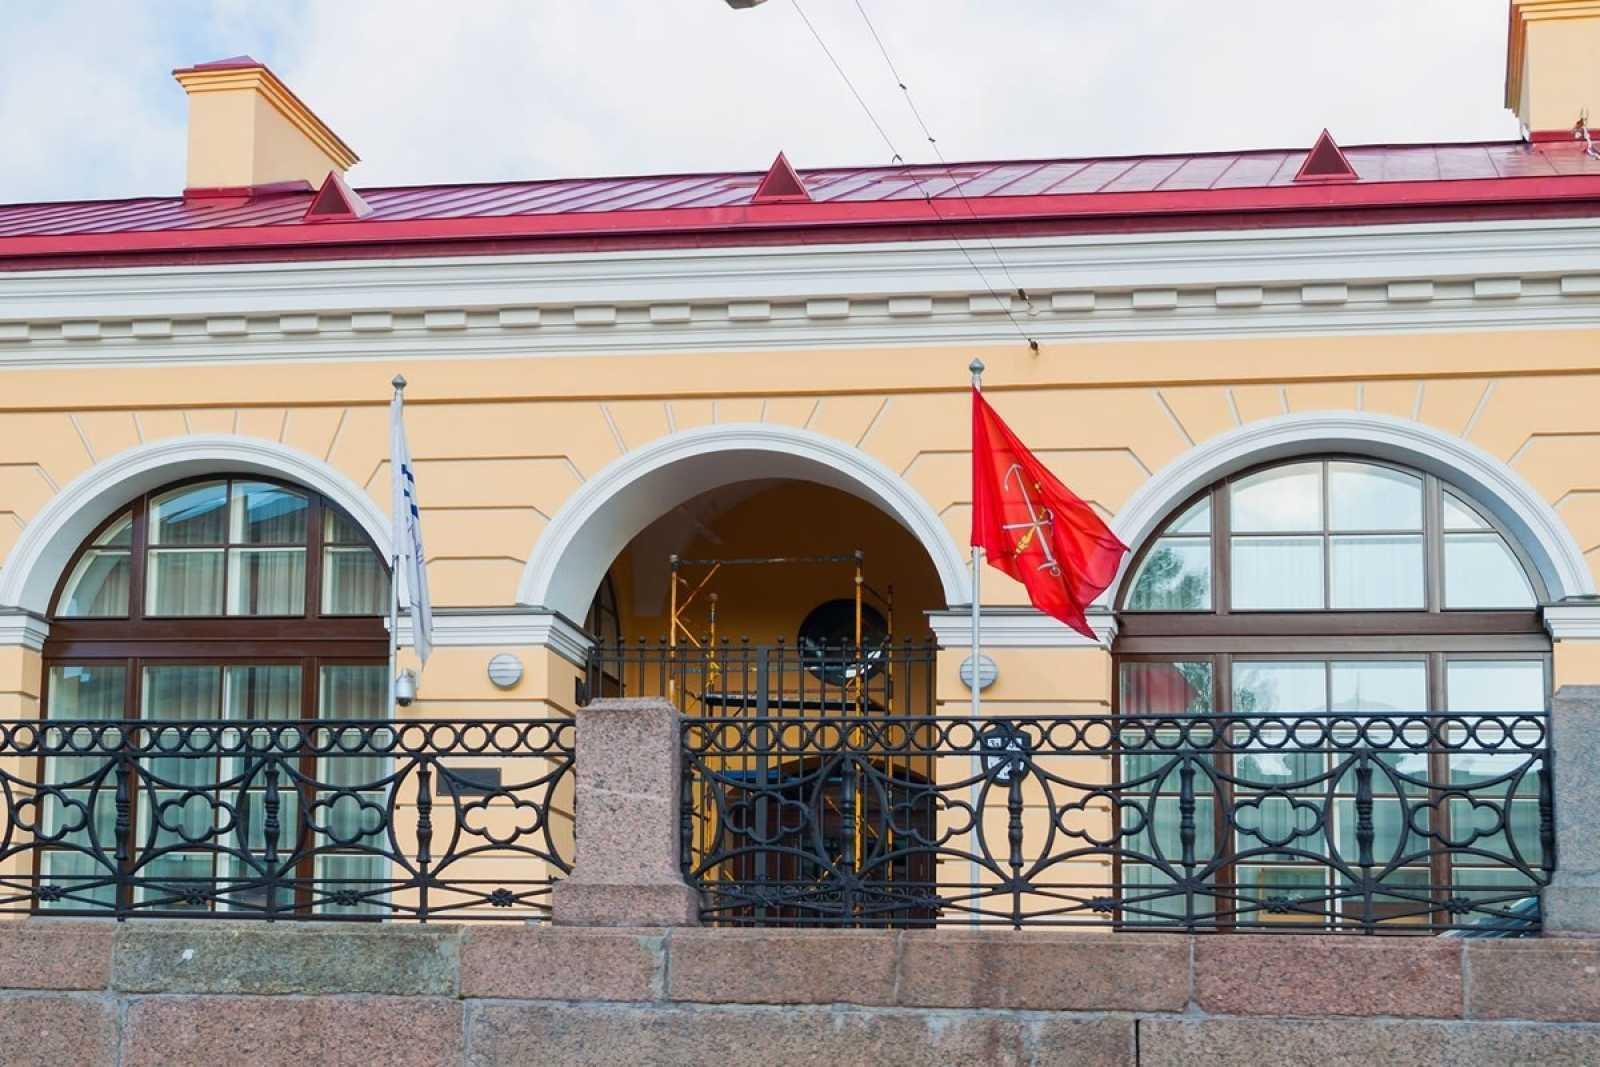 Sovcomflot building 75nknlar8